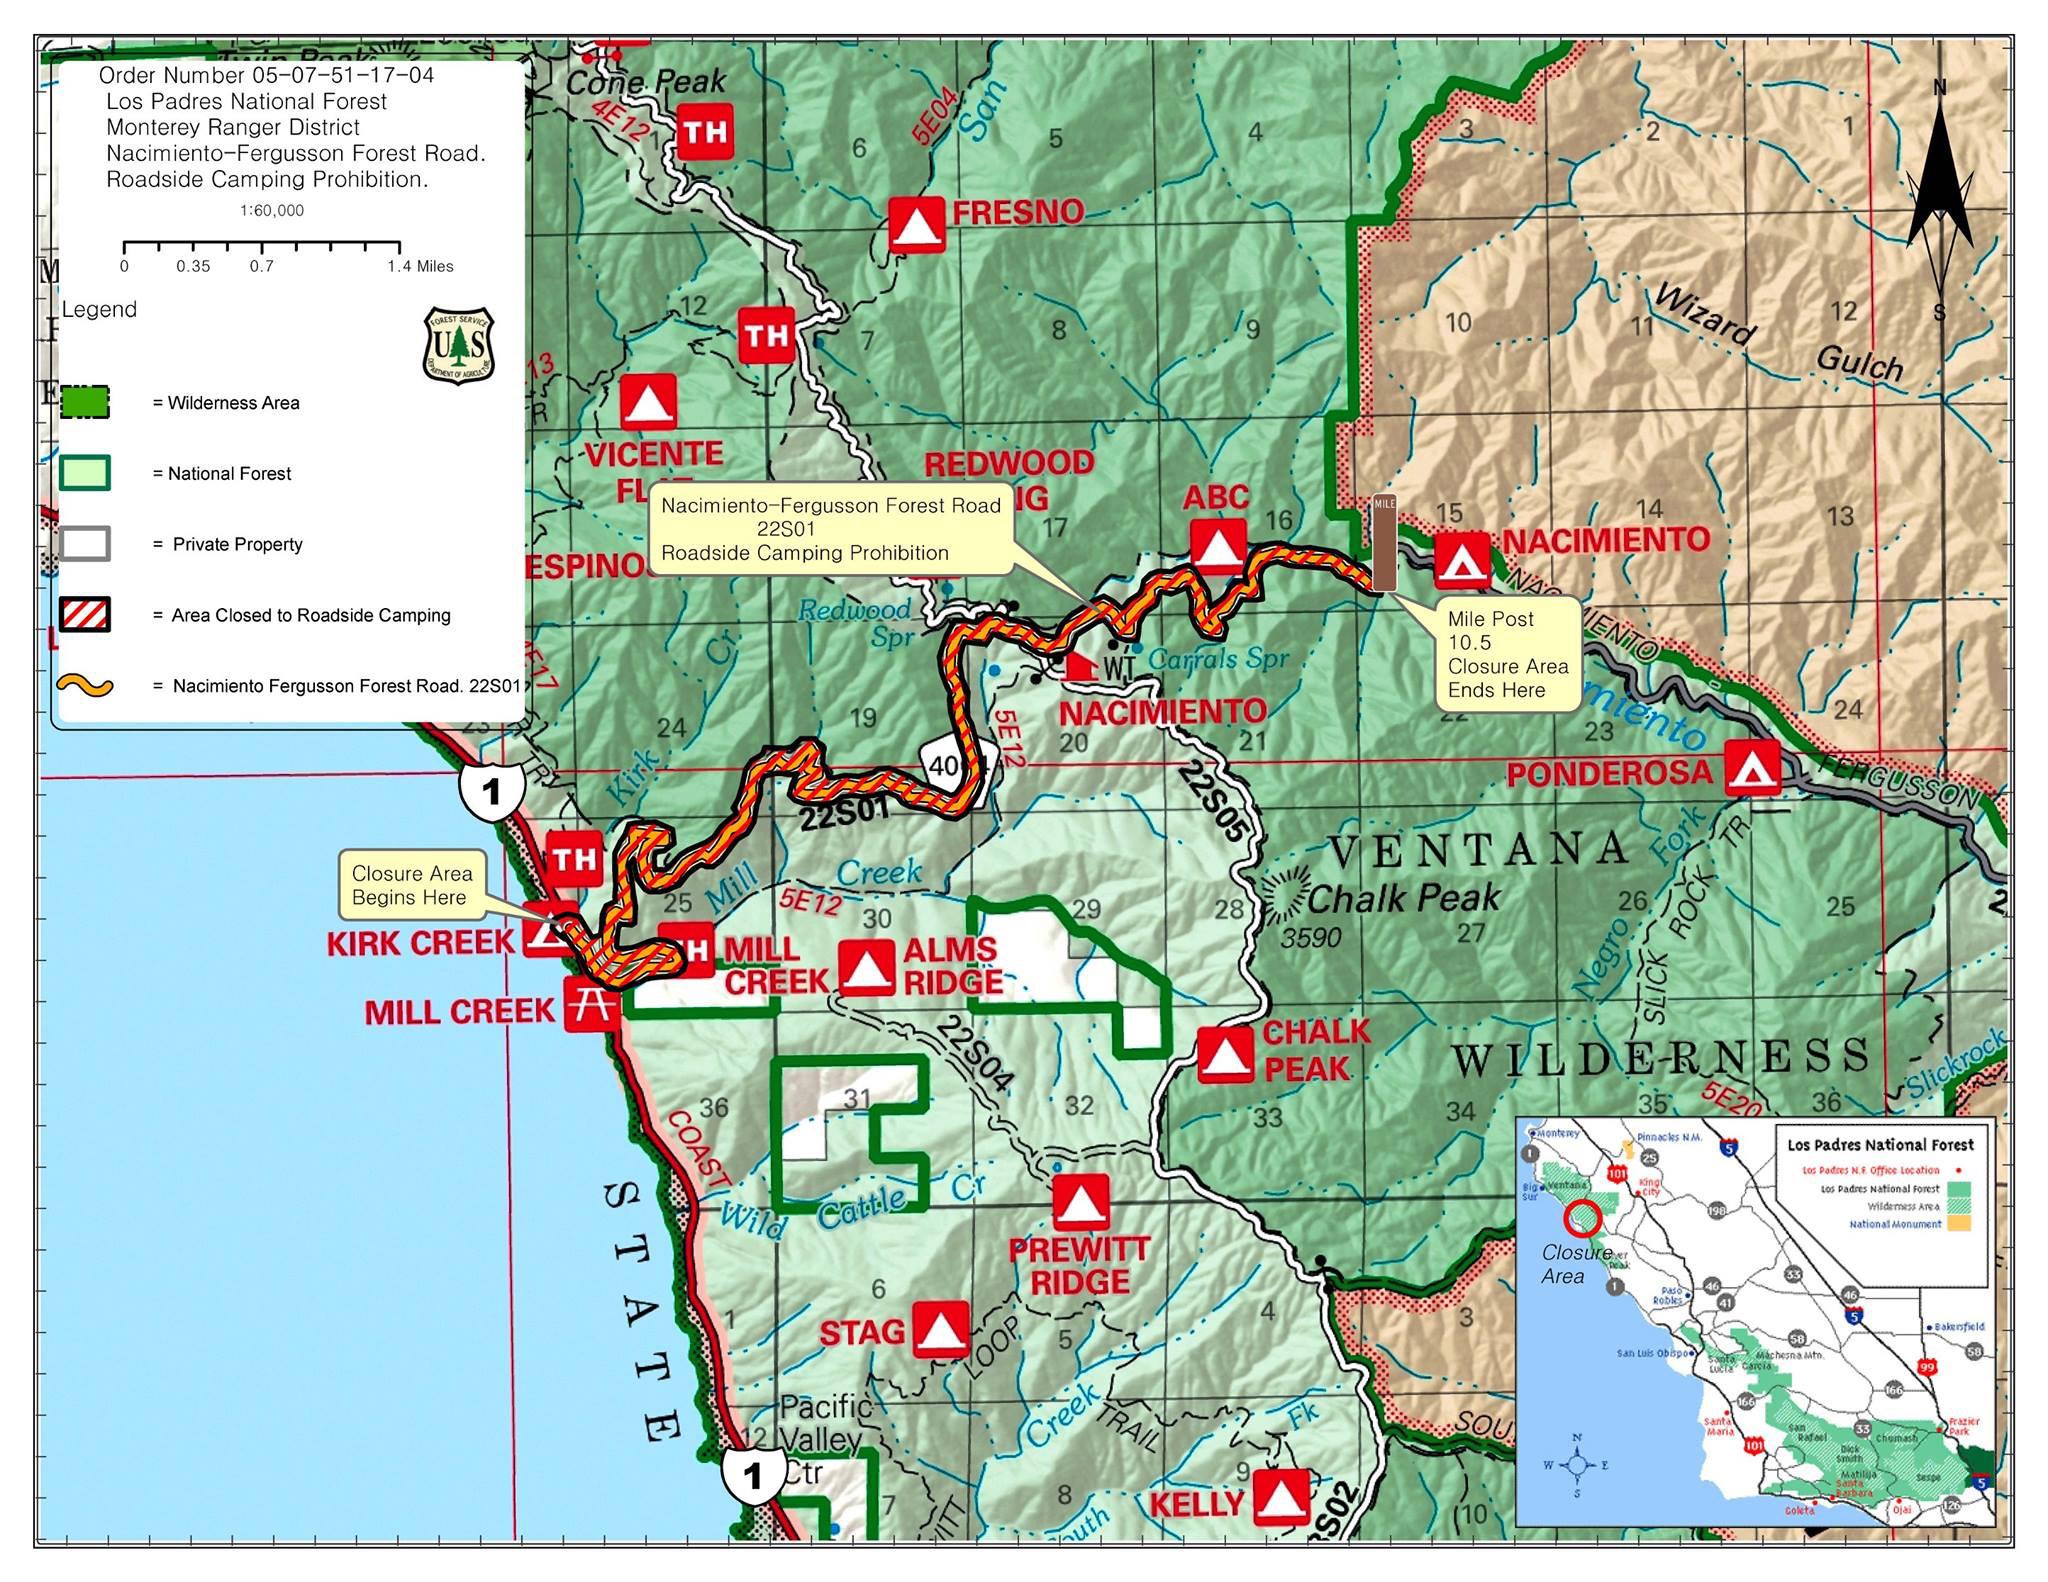 Printable Travel Maps Of Coastal California Moon Com Inside Map - Free Printable Travel Maps